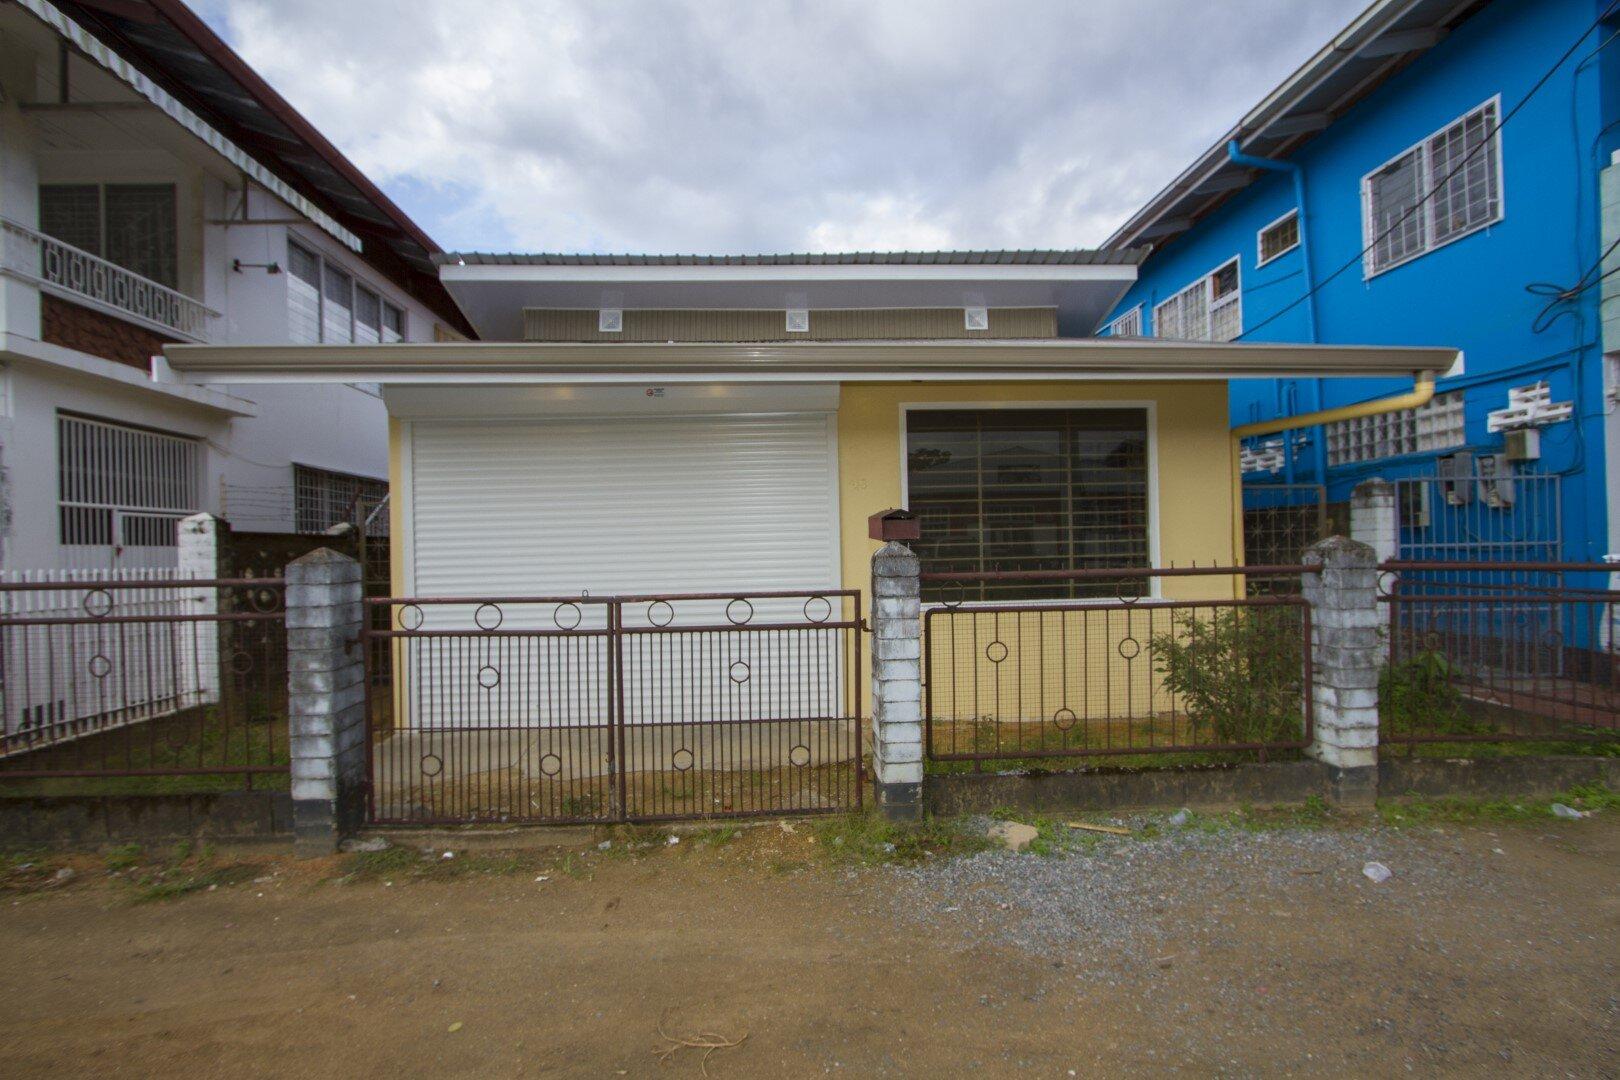 Molenpad 48 - Zuid - Suriname - Surgoed Makelaardij NV